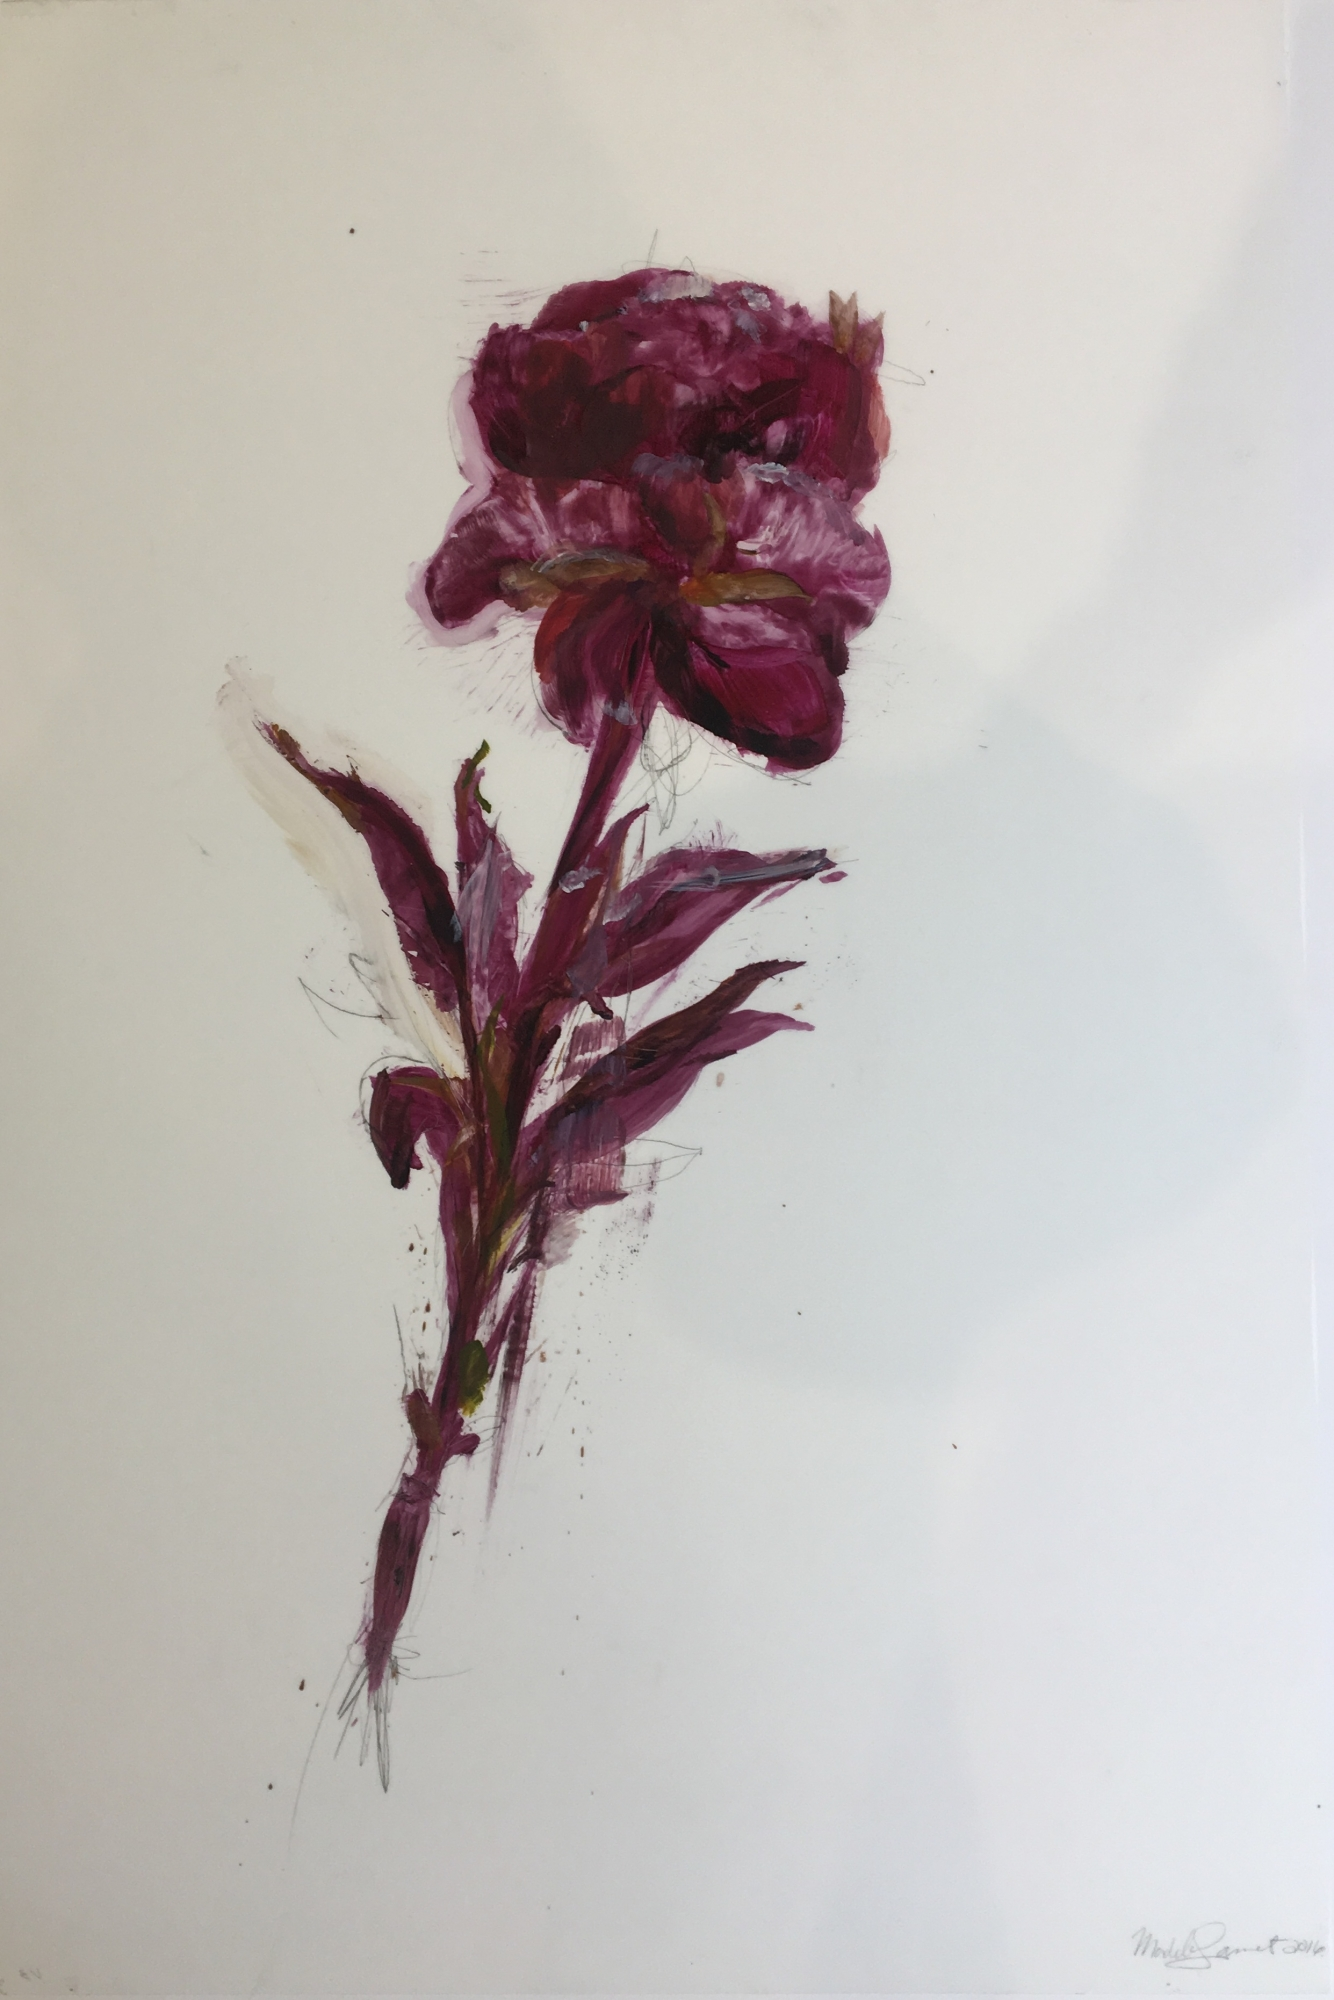 Purple Peony 2016  by Madeleine Lamont